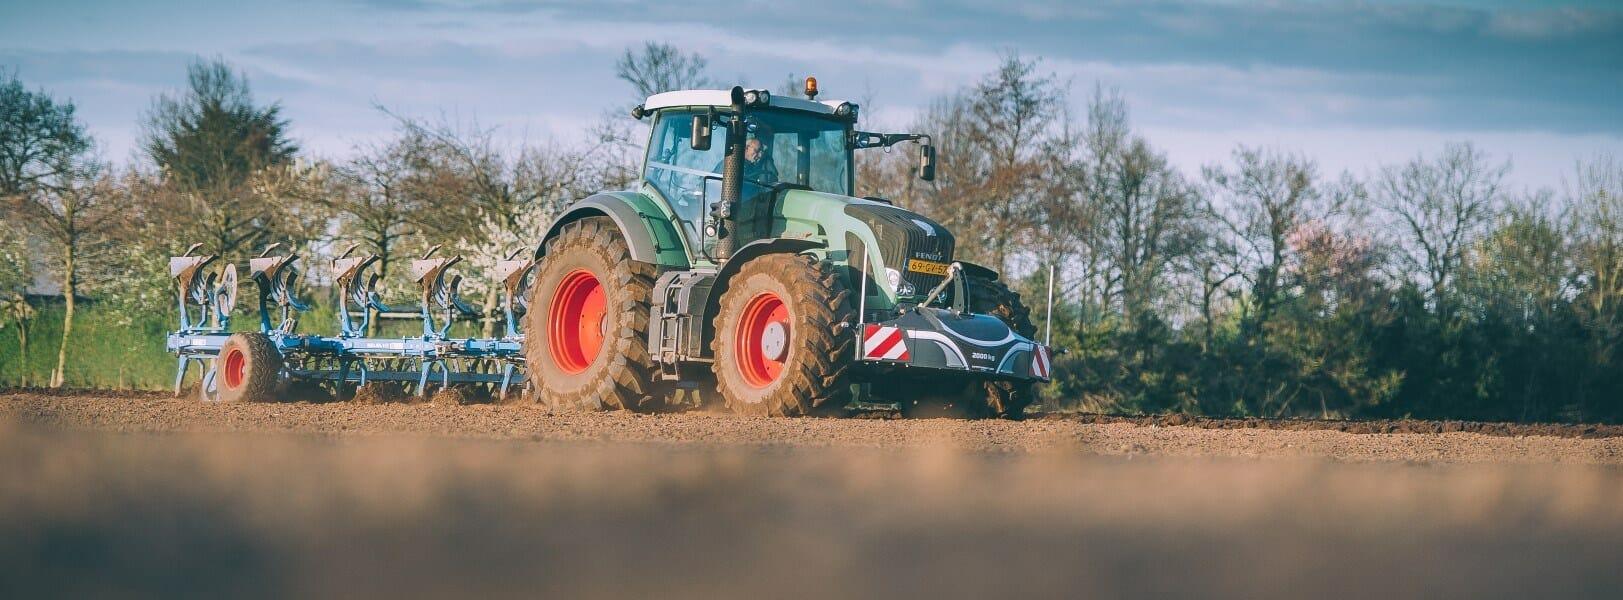 bumper-tractor